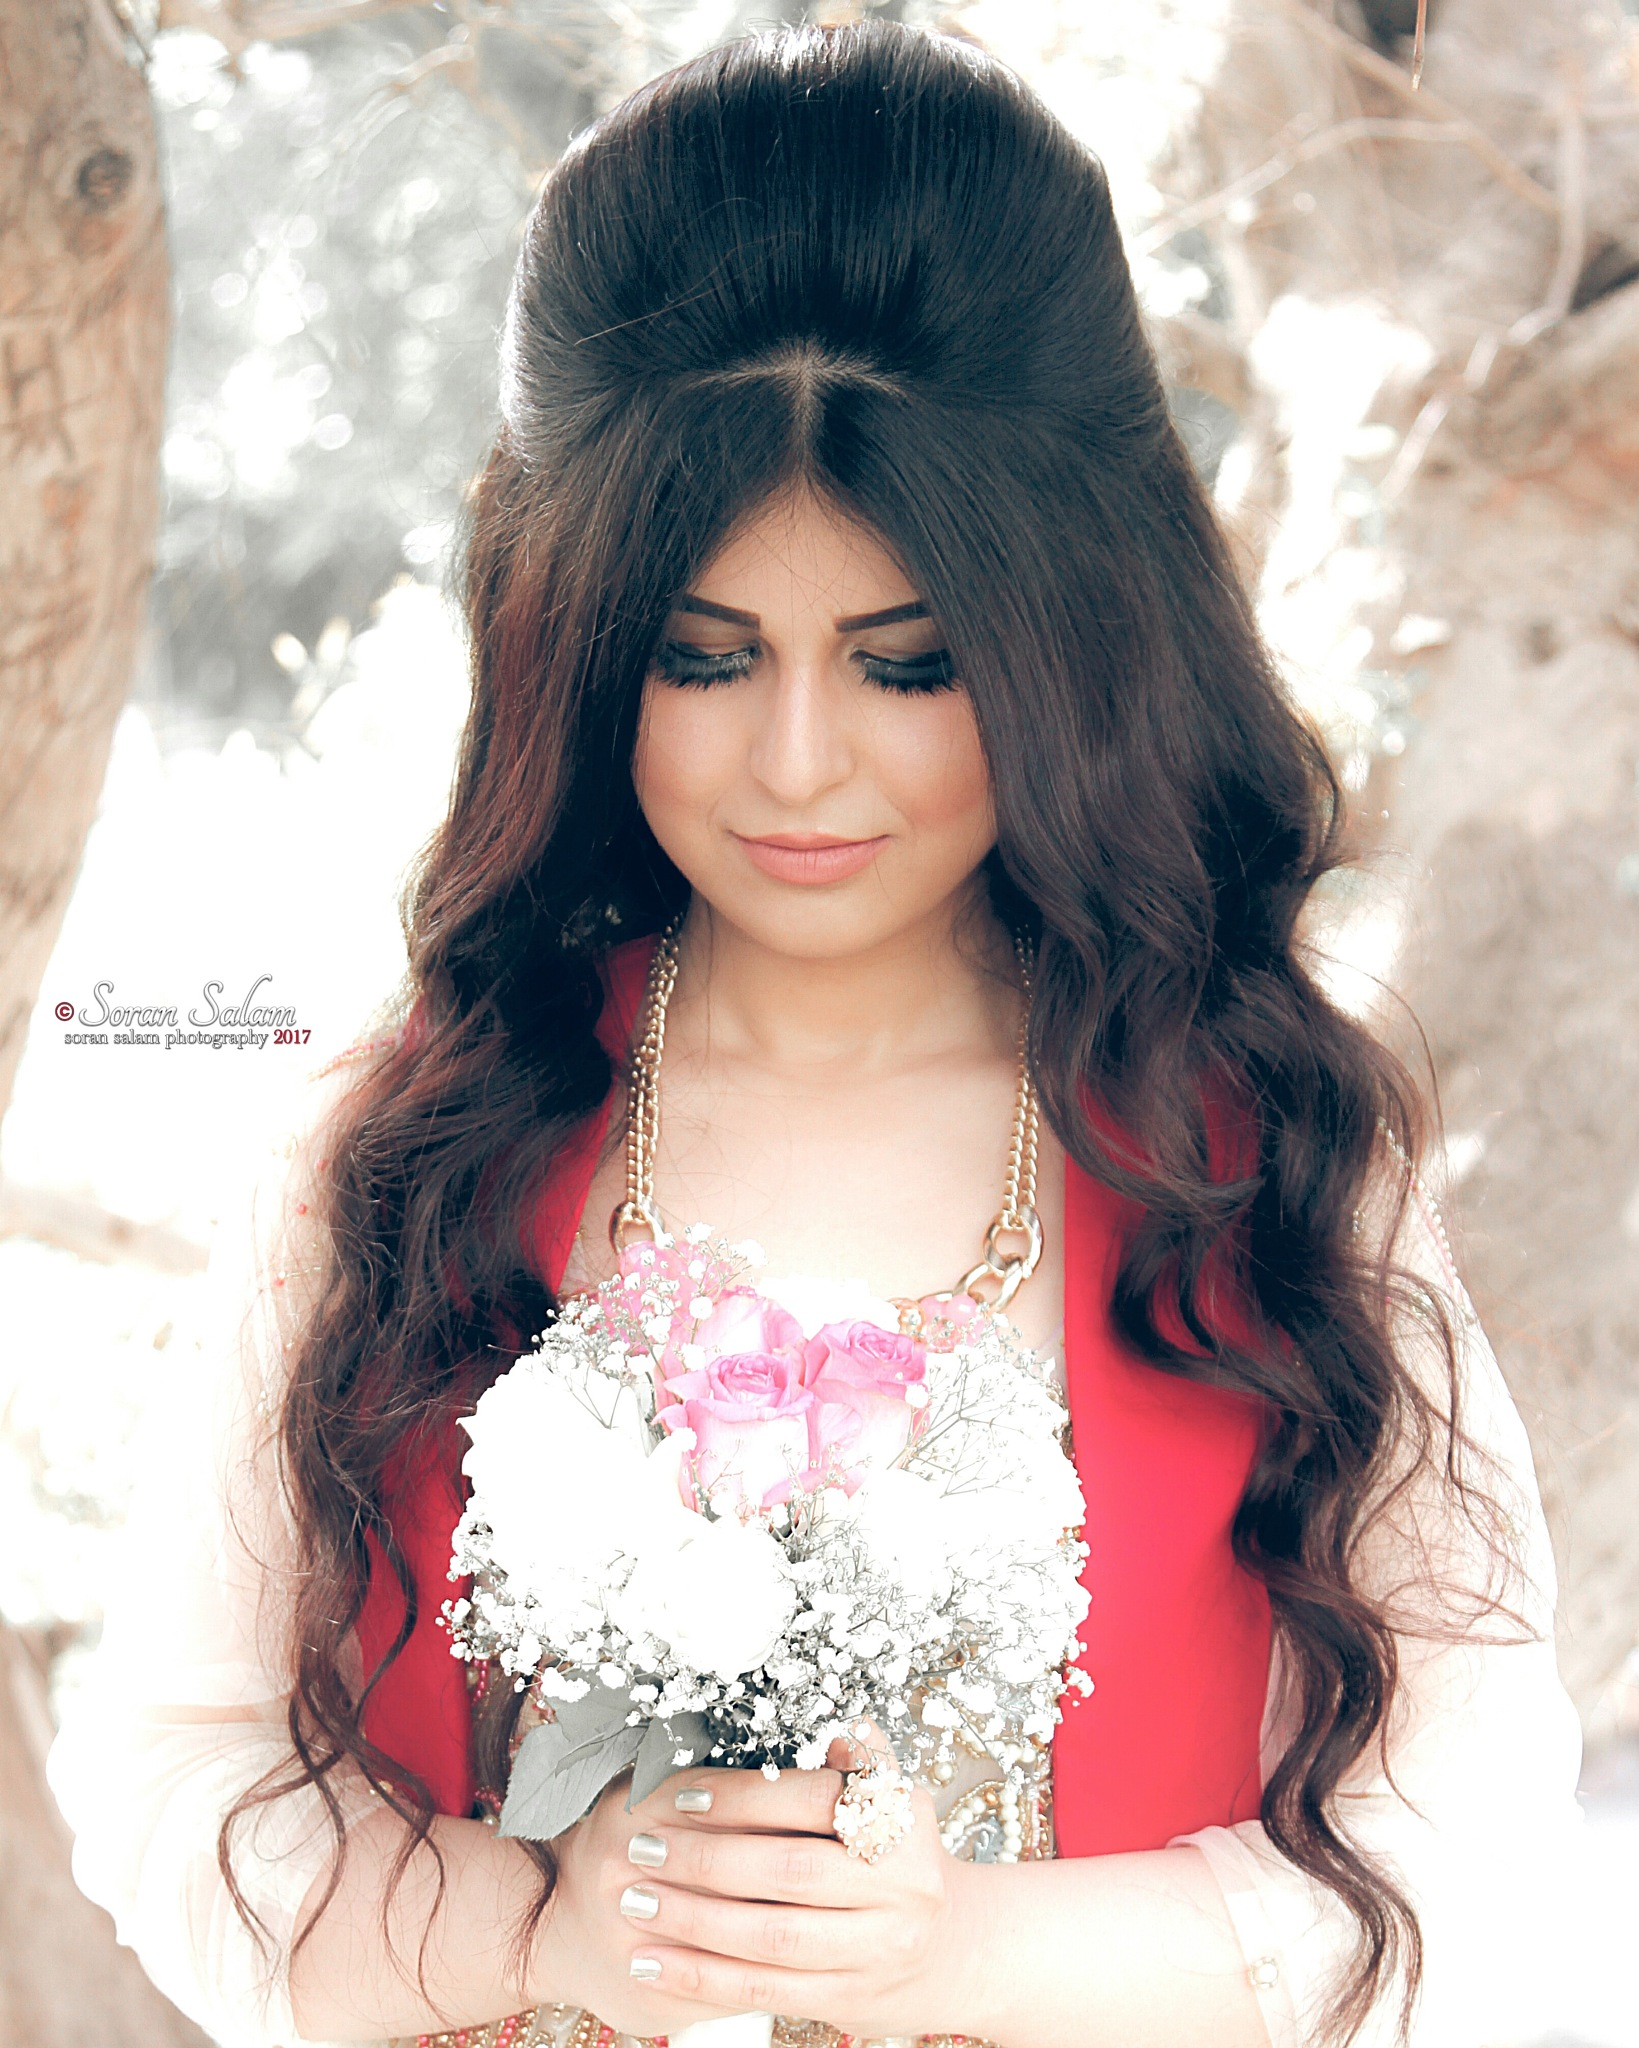 kurdistan by Soran Salam .. photography